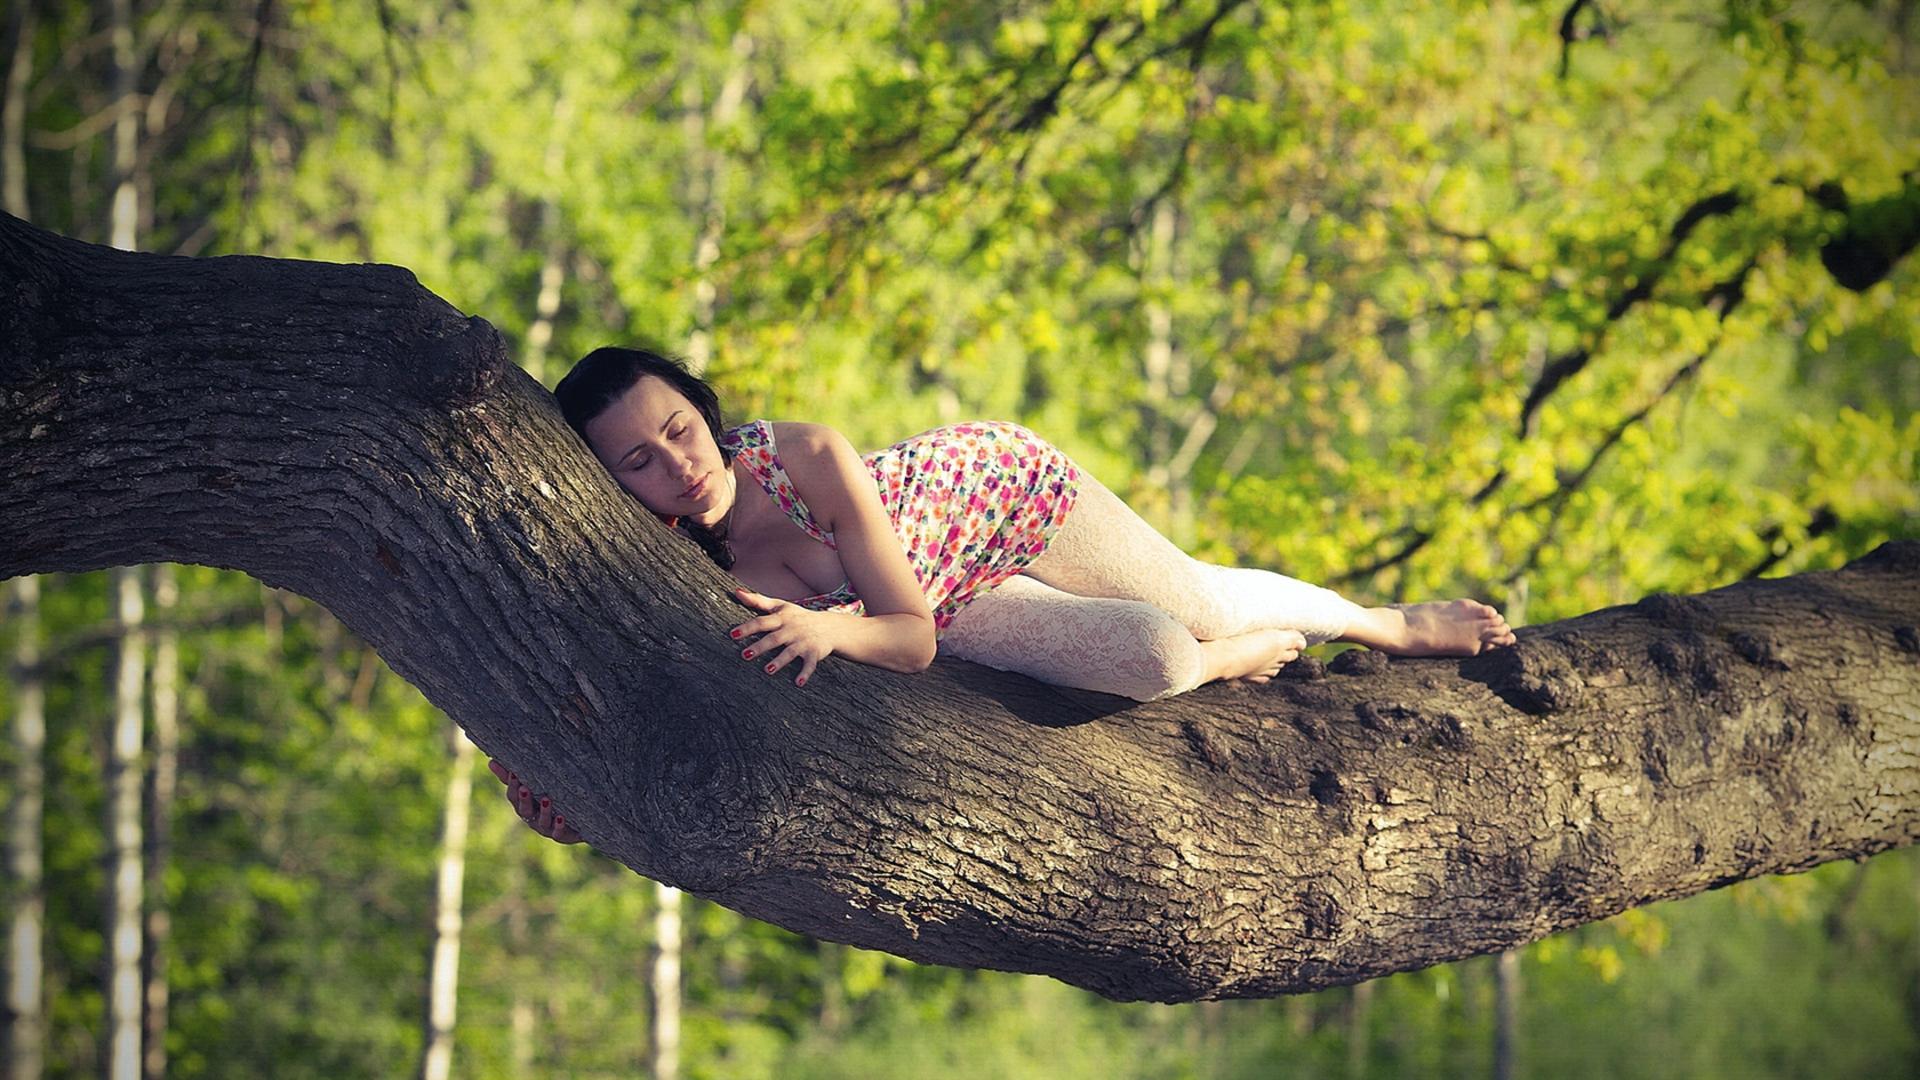 фото спят в лесу